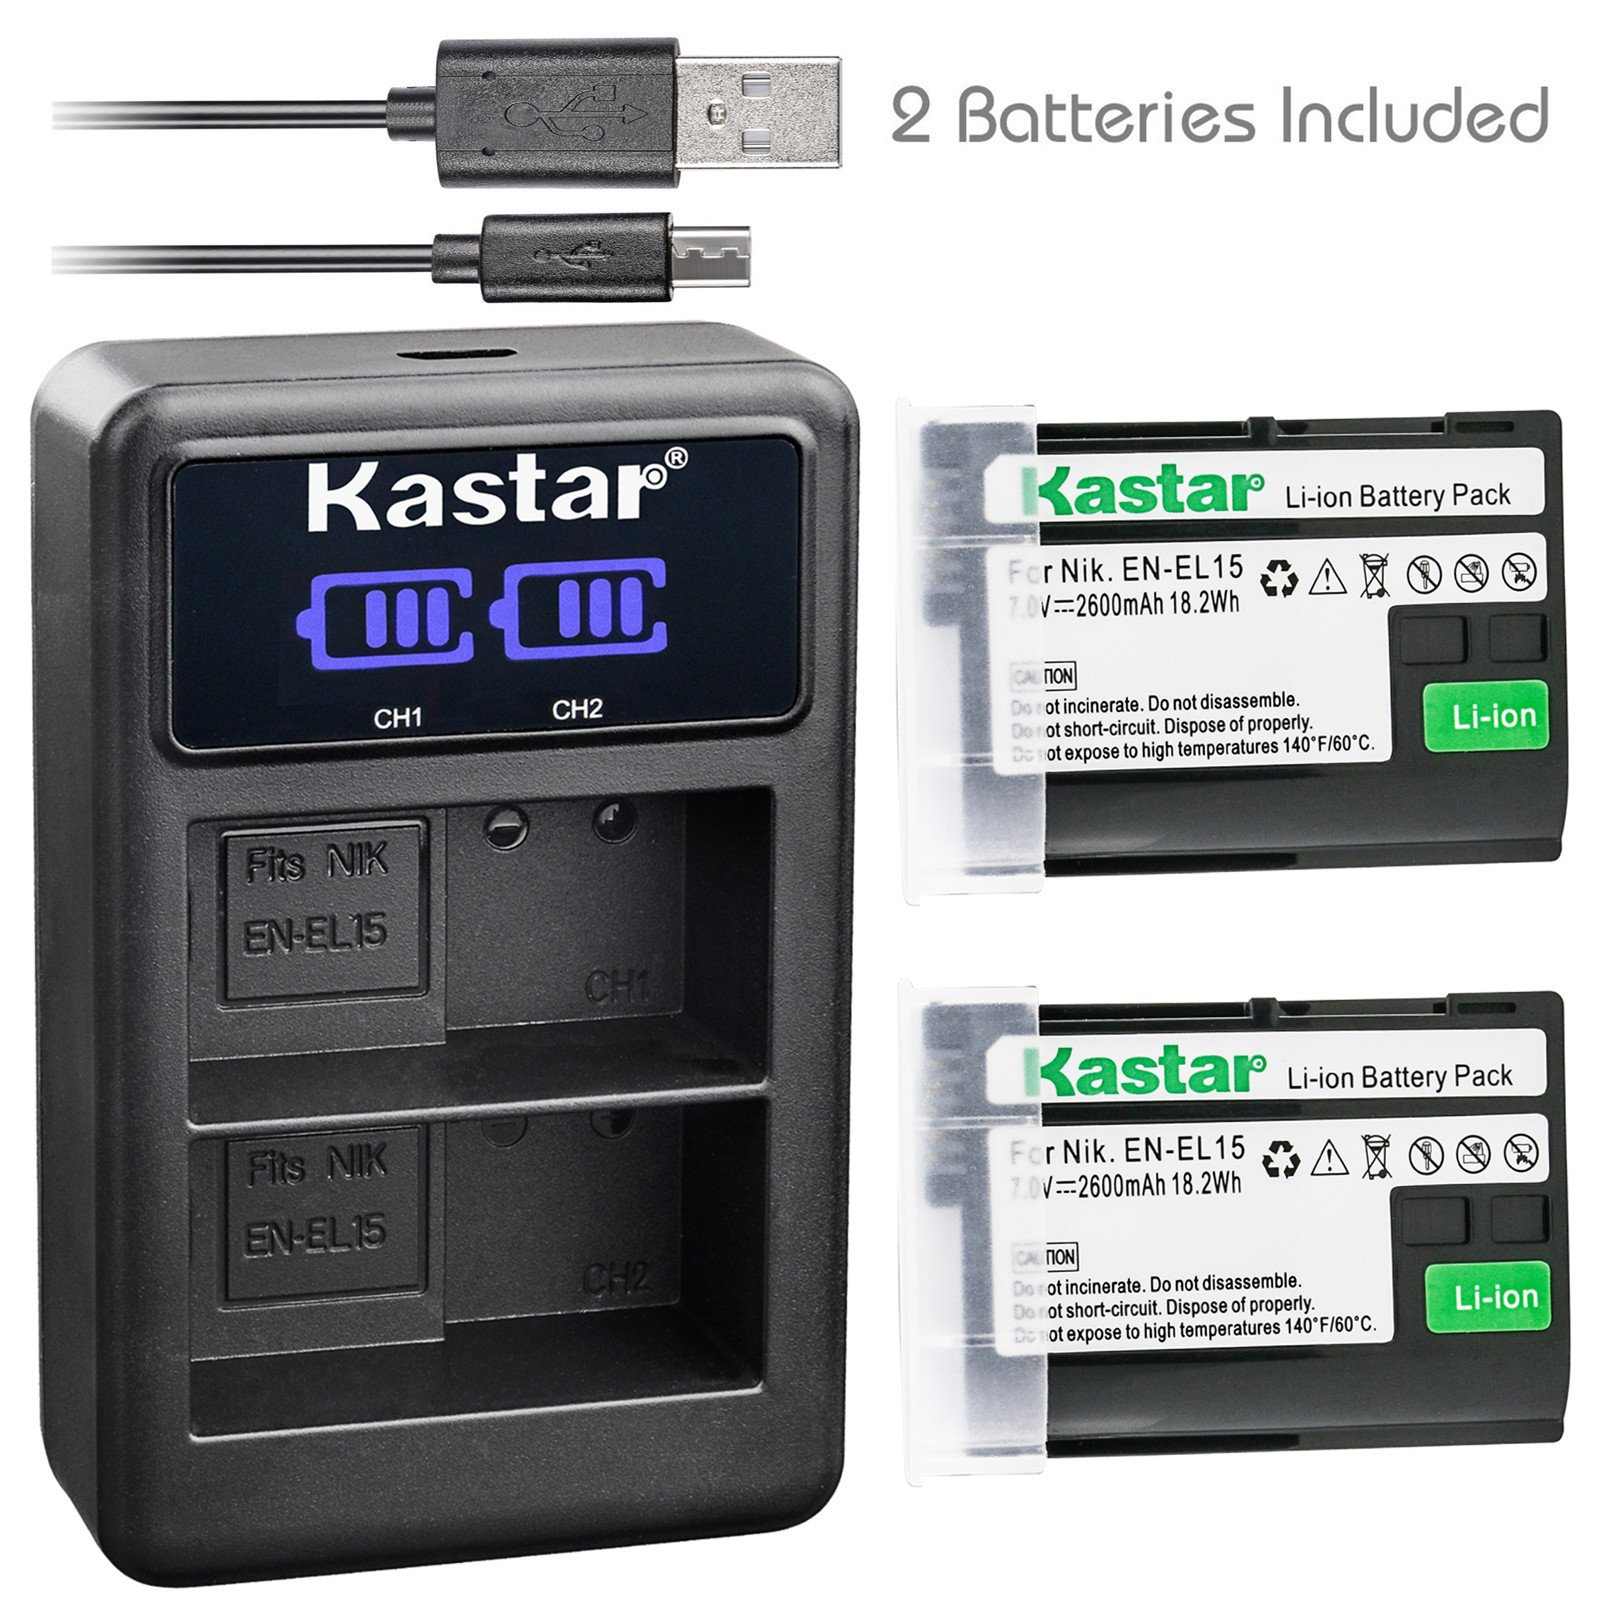 Kastar Battery (X2) & LCD Dual Charger for Nikon EN-EL15 Battery, Nikon MH-25 Charger and Nikon 1 V1 D500 D600 D610 D750 D800 D800E D810 D810A D850 D7000 D7100 D7200 D7500 Digital Cameras